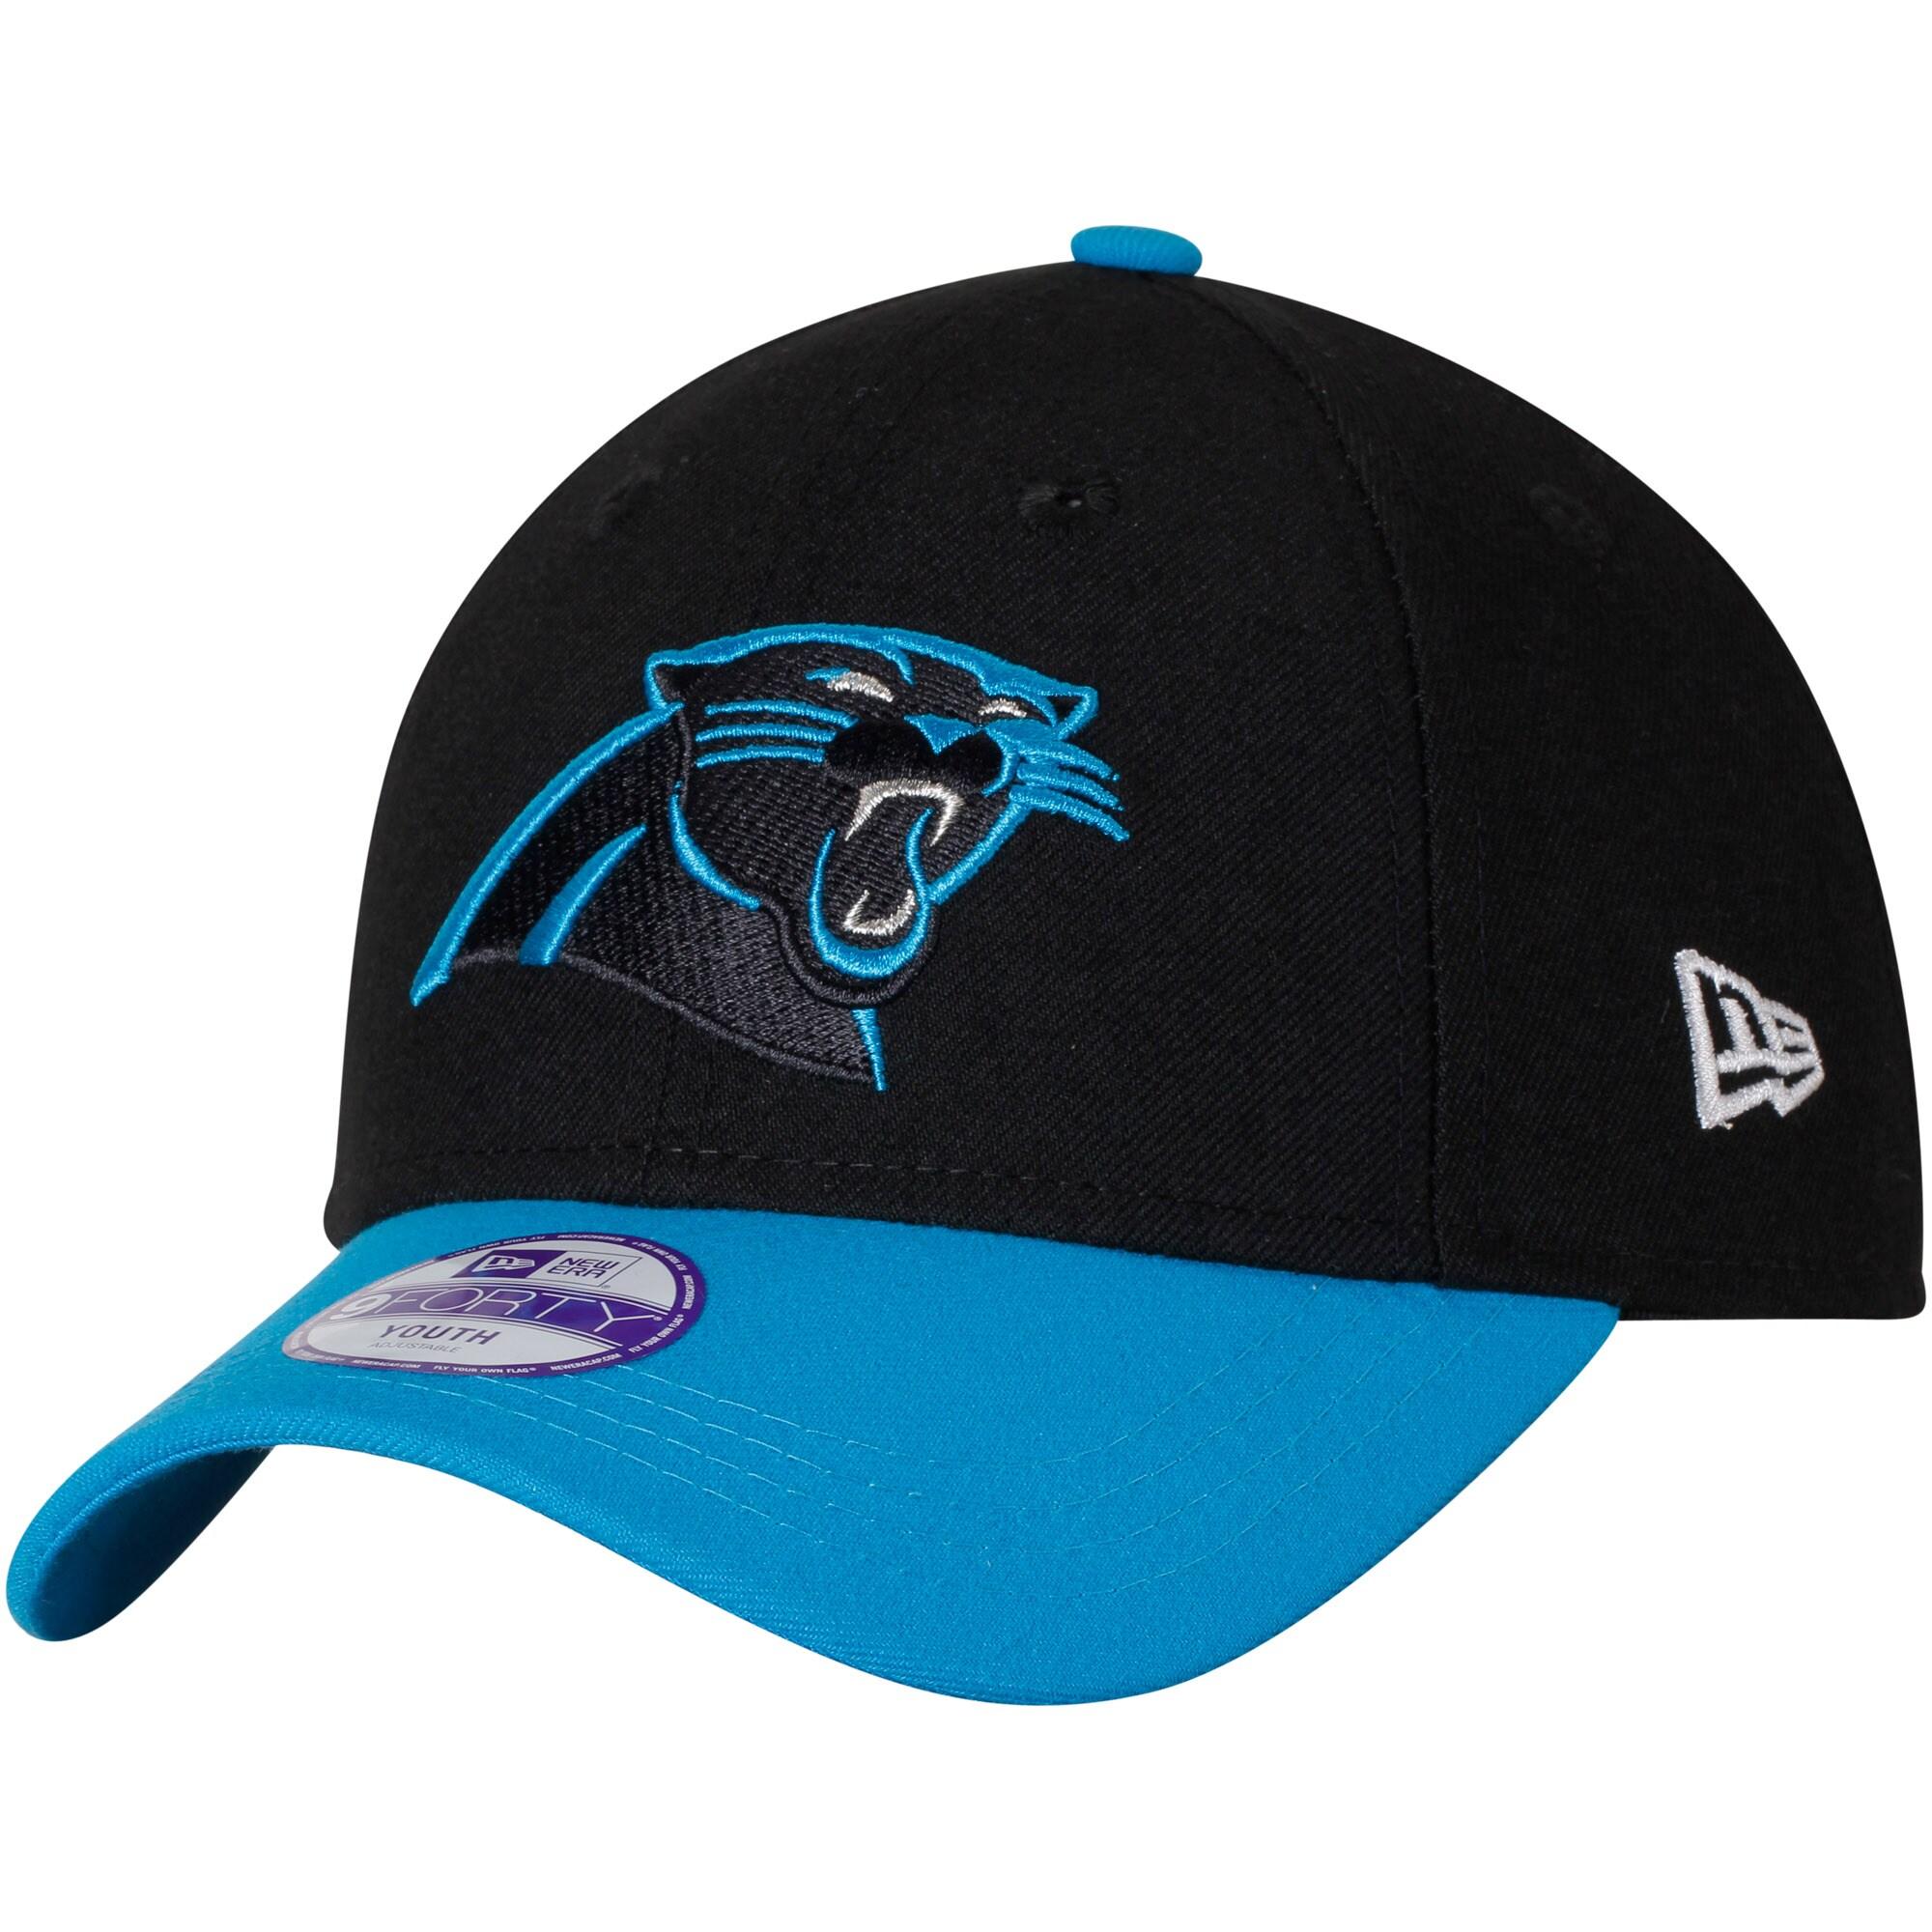 Carolina Panthers New Era Youth League 9FORTY Adjustable Hat - Black/Blue